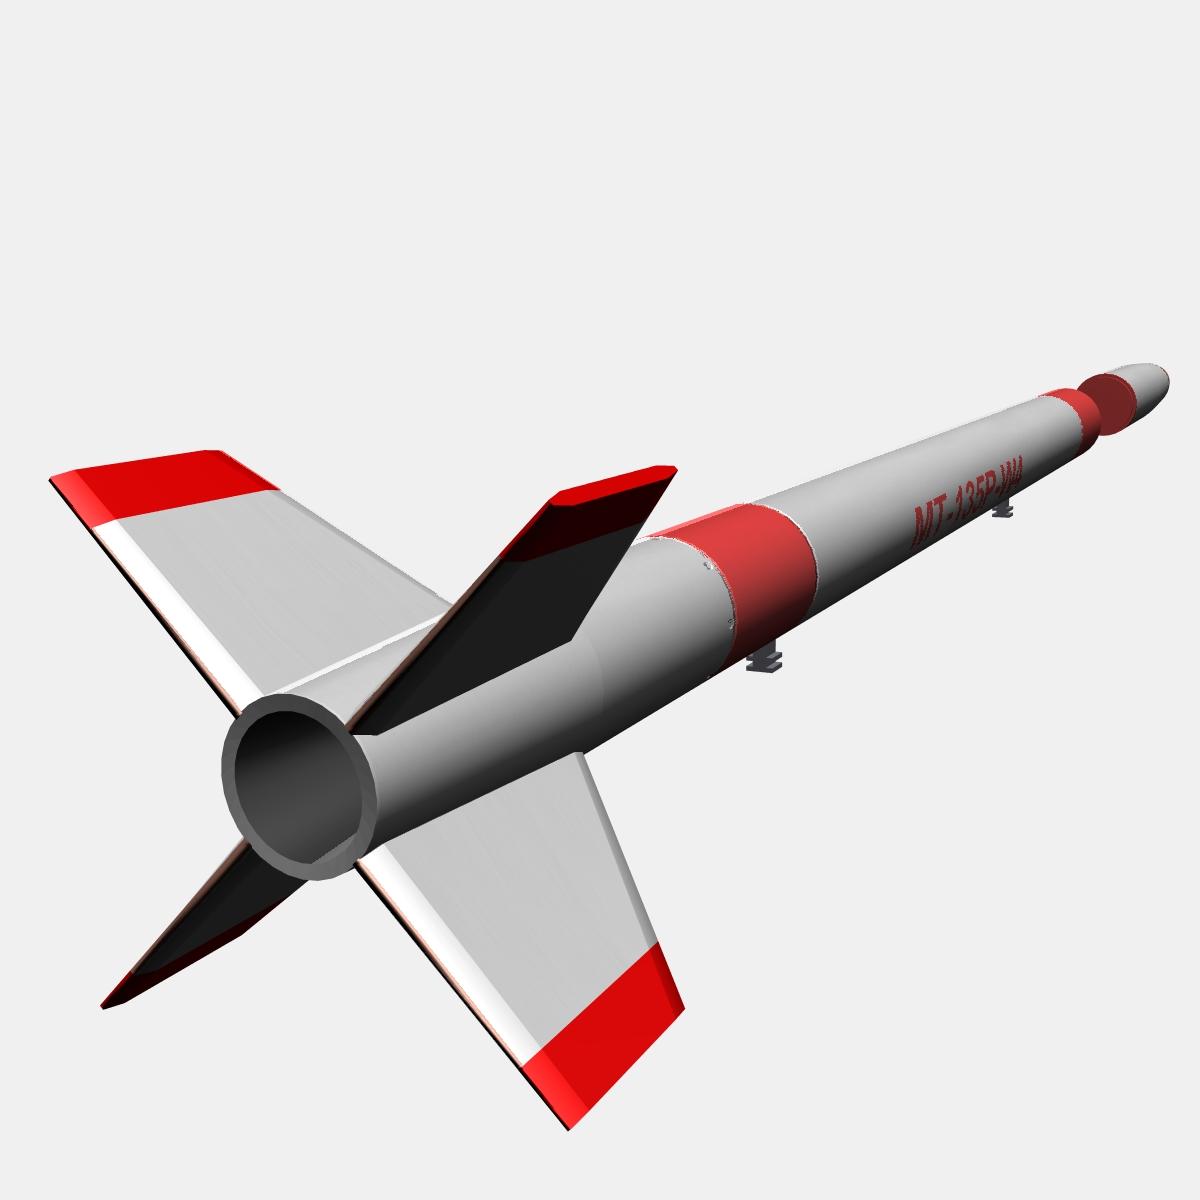 Japanese MT-135 Rocket 3d model 3ds dxf fbx blend cob dae X  obj 158751